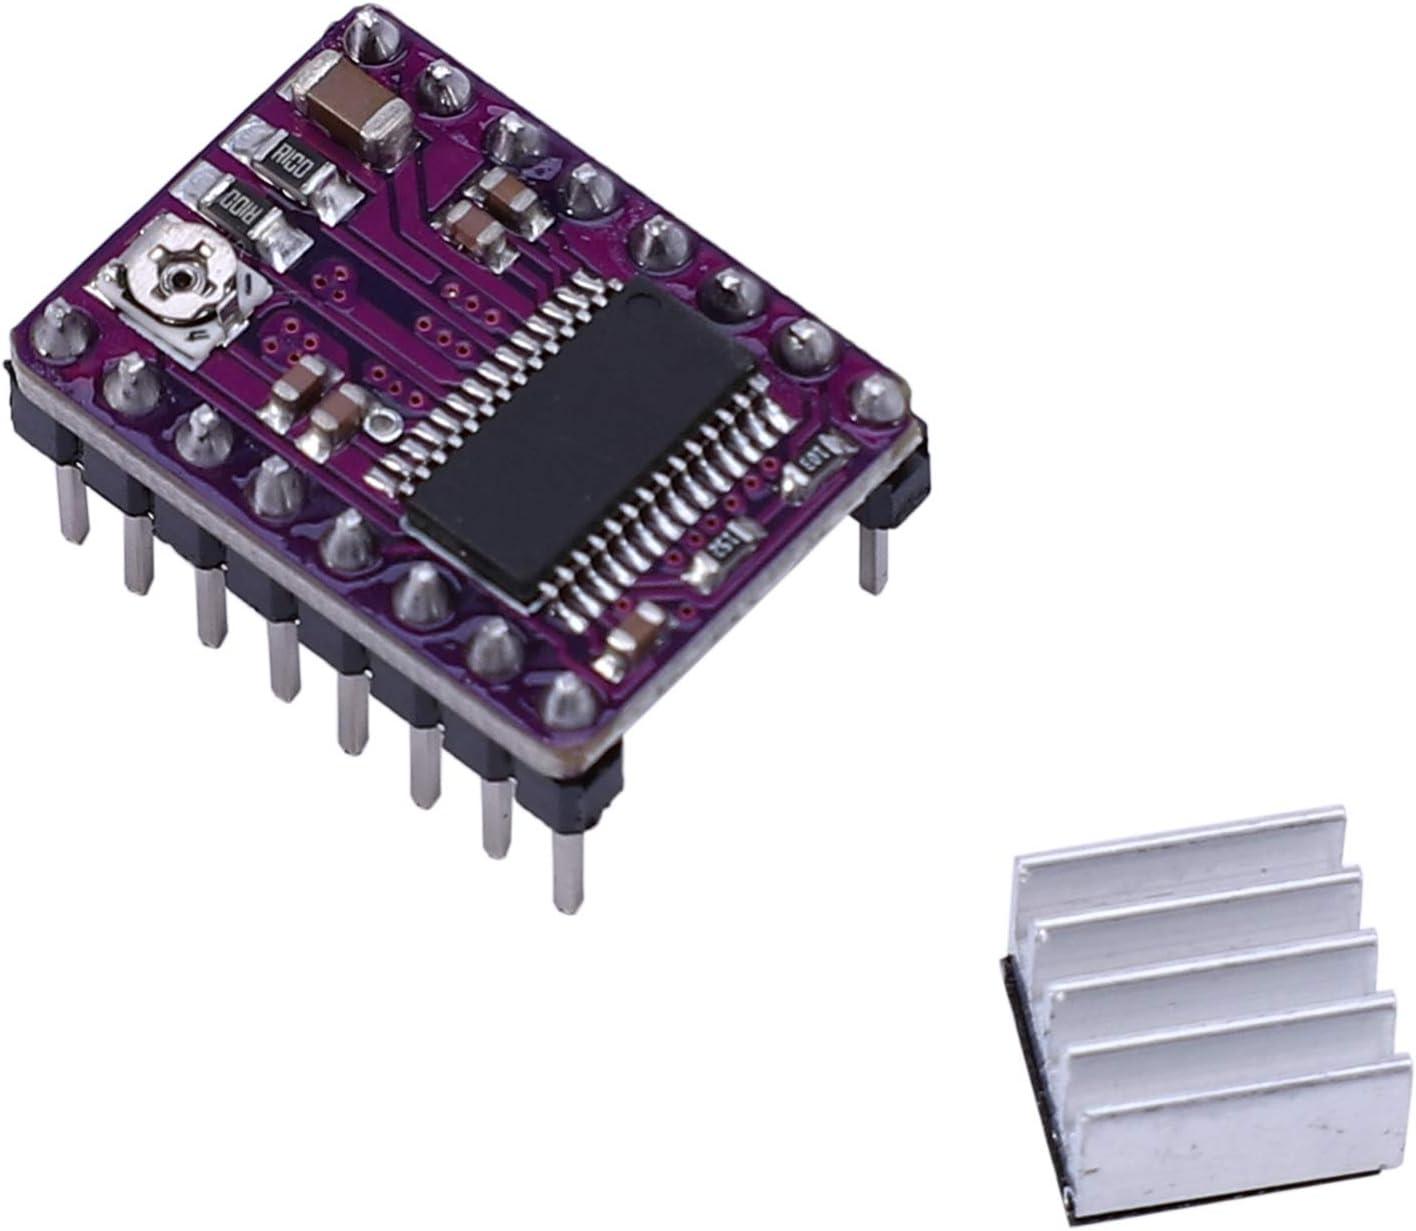 Semoic 10Pcs Stepstick Drv8825 Stepper Motor Driver 4 PCB Board Replace A4988 3D Printer Parts for SKR V1.3 PRO MKS GEN